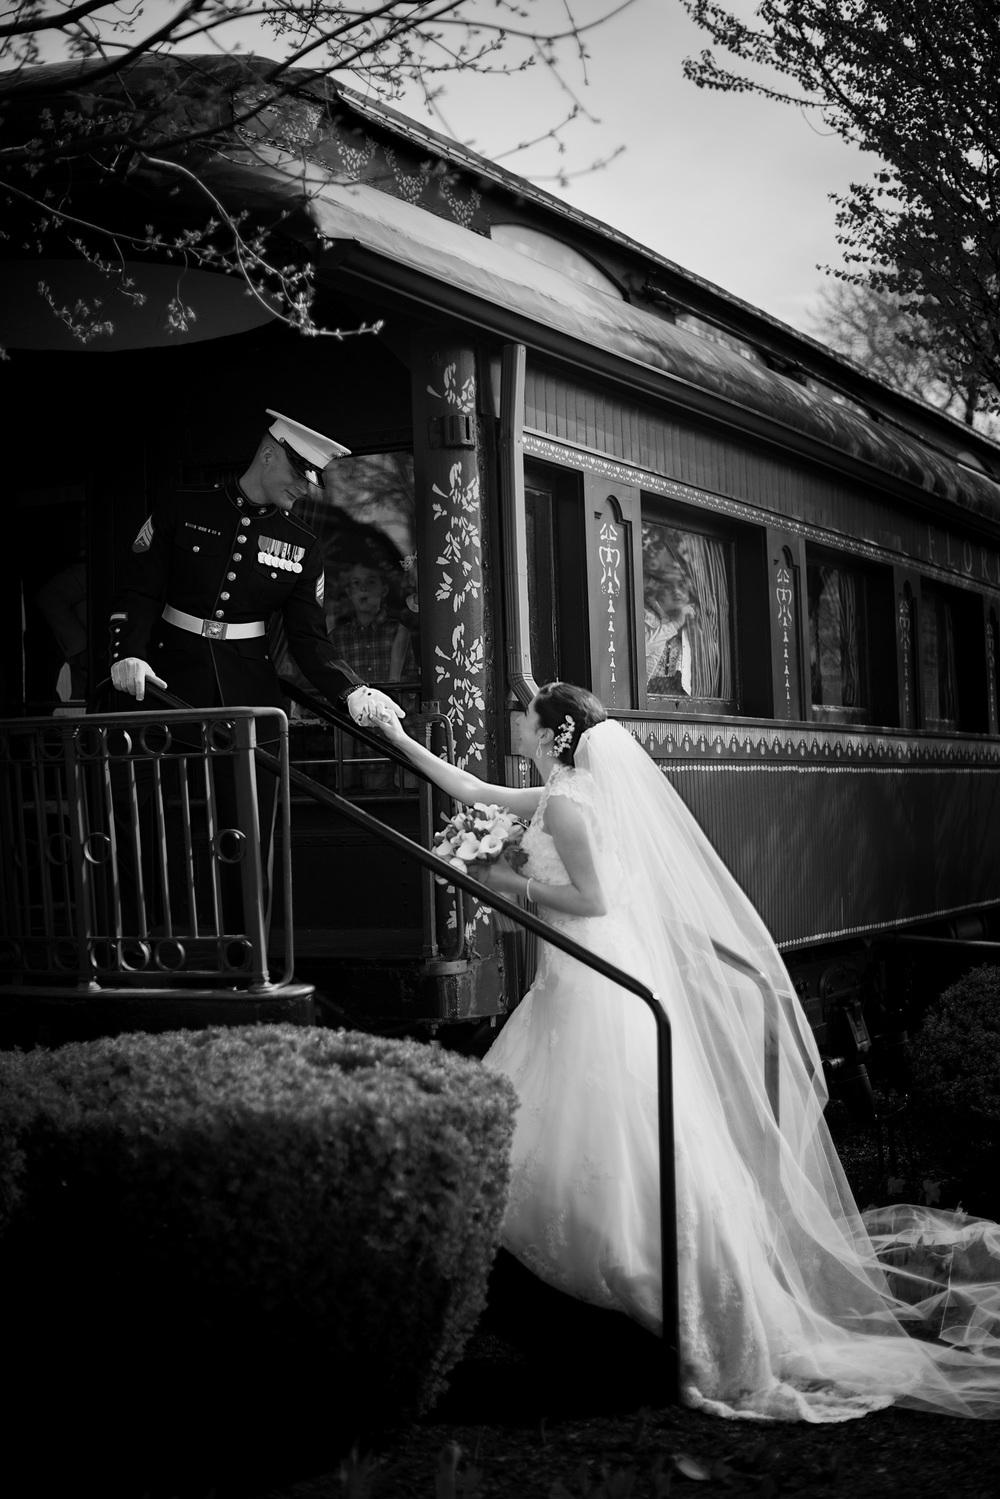 groom bride train aboard portrait THPHOTO